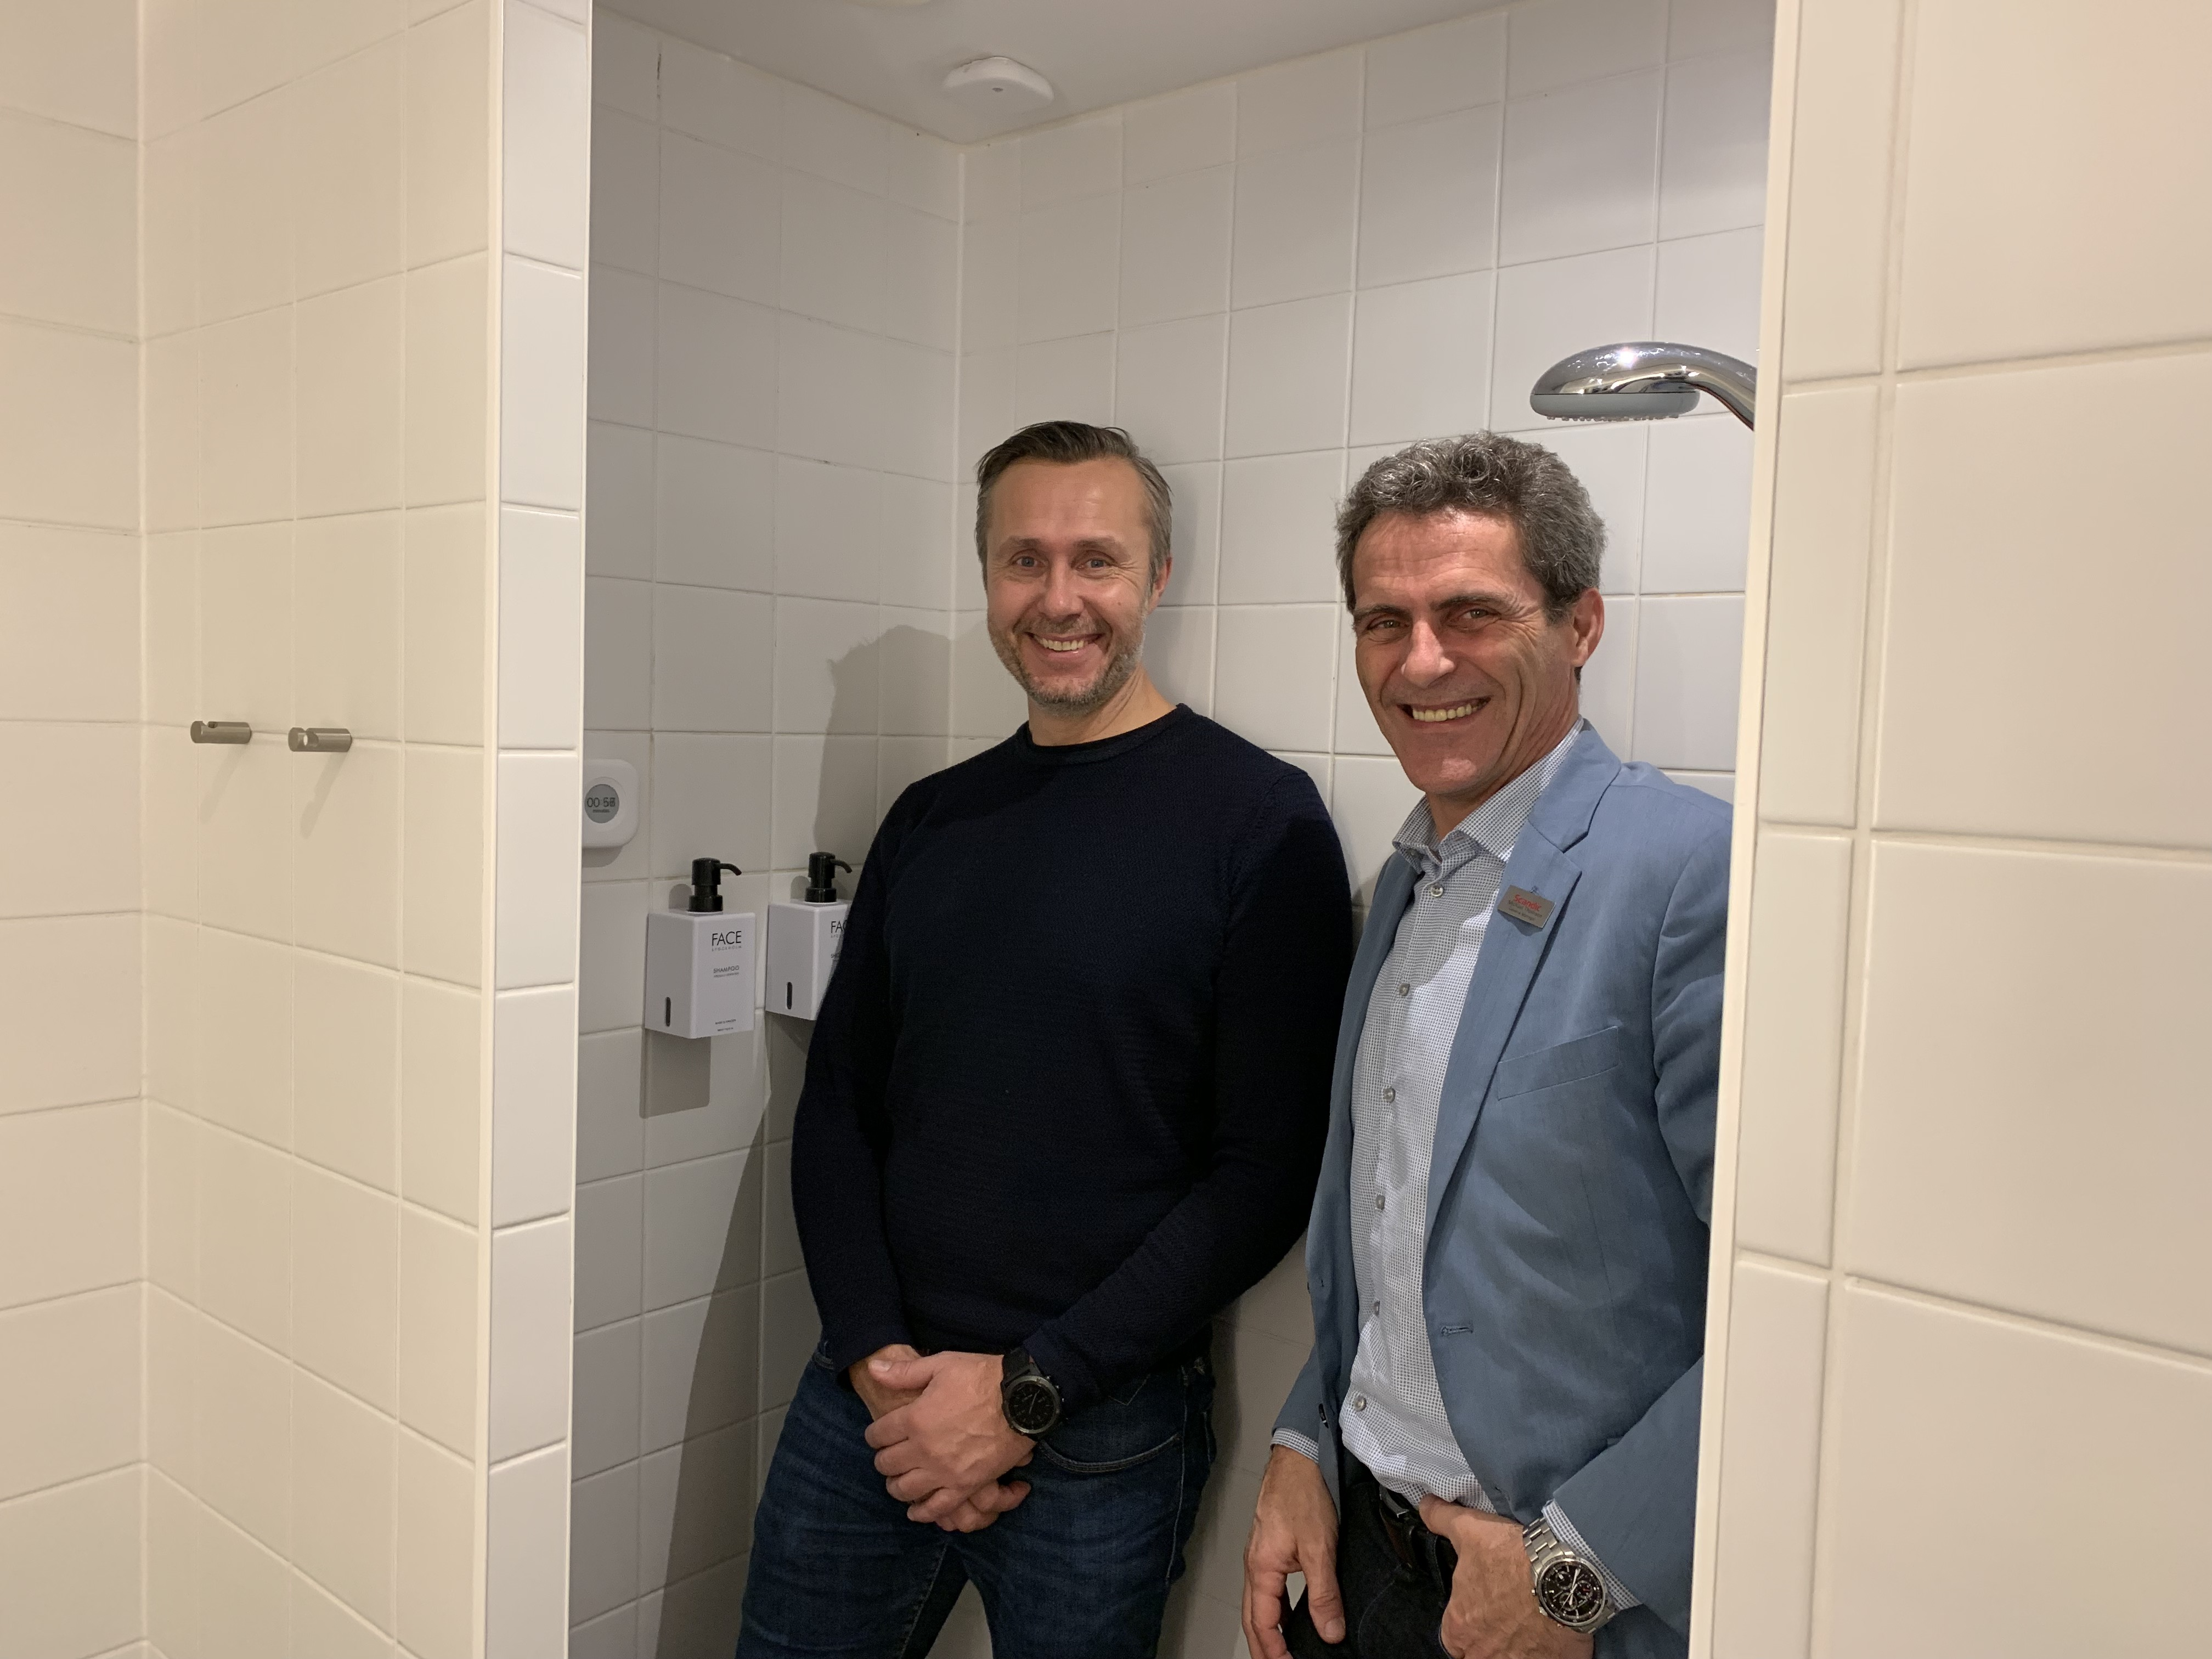 Aguardios direktør, Thomas Munch-Laursen, til venstre, og Michael Thomsen, hoteldirektør for Scandic Jacob Gade i Vejle. Foto: Scandic.